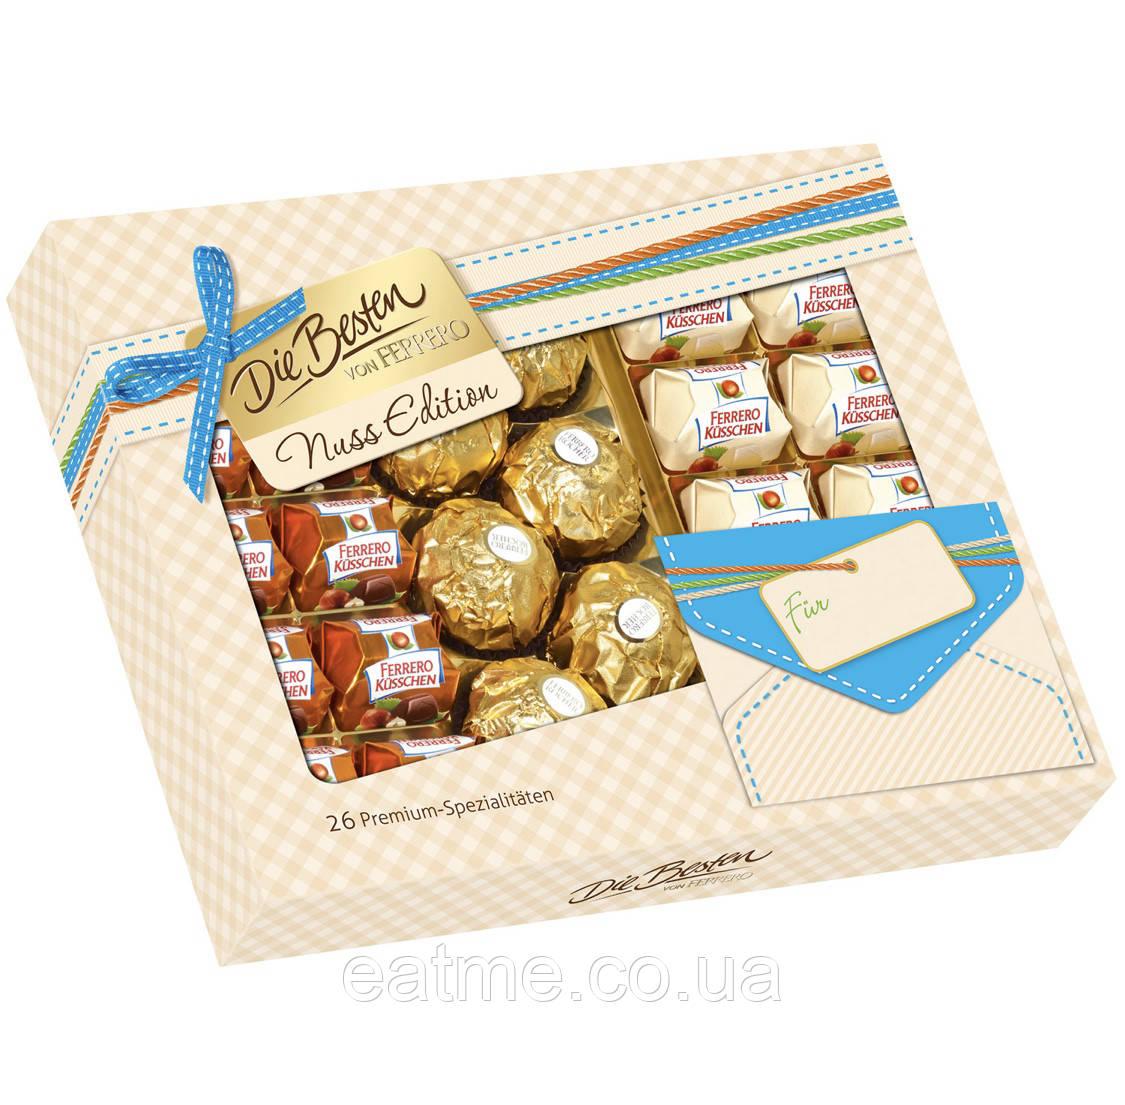 Die Besten von Ferrero Nuss Edition вкуснейший набор конфет Ferrero